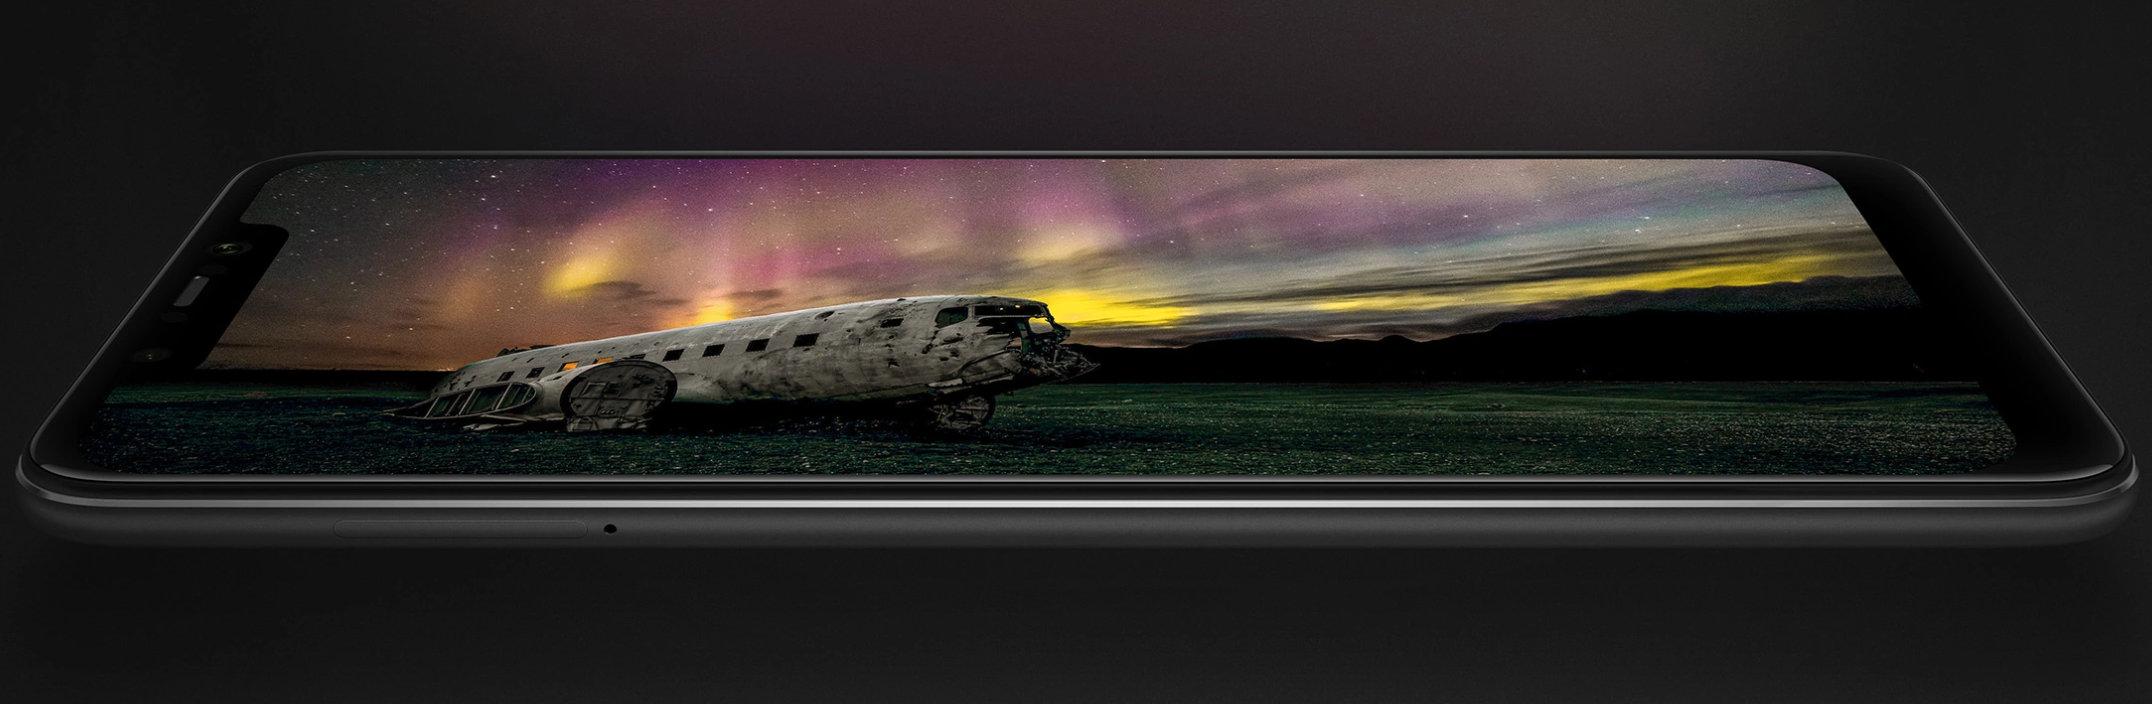 Xiaomi POCOPHONE F1 llega a España esta misma semana 35